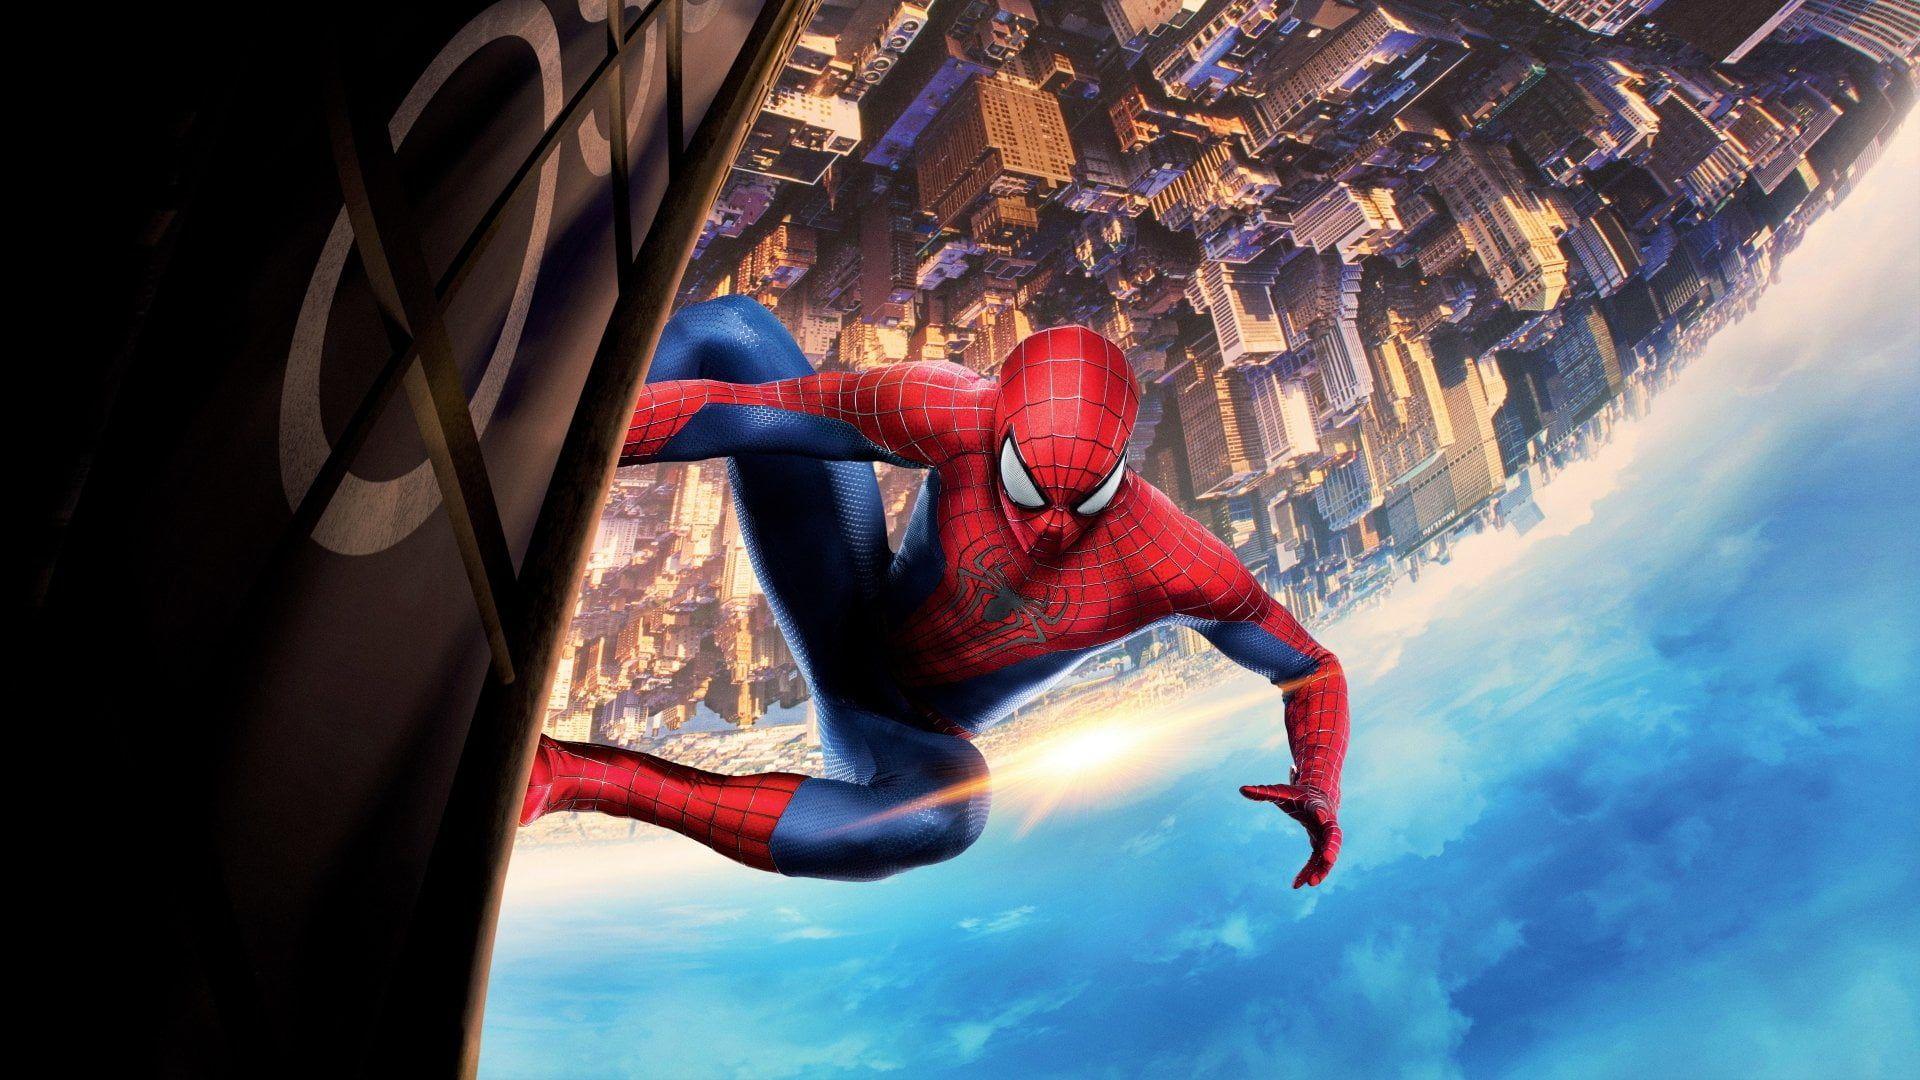 Spider Man The Amazing Spider Man 2 Building Movie 1080p Wallpaper Hdwallpaper Desktop 8k Wallpaper Spiderman 4k Wallpaper For Mobile The amazing spider man 2 wallpaper for